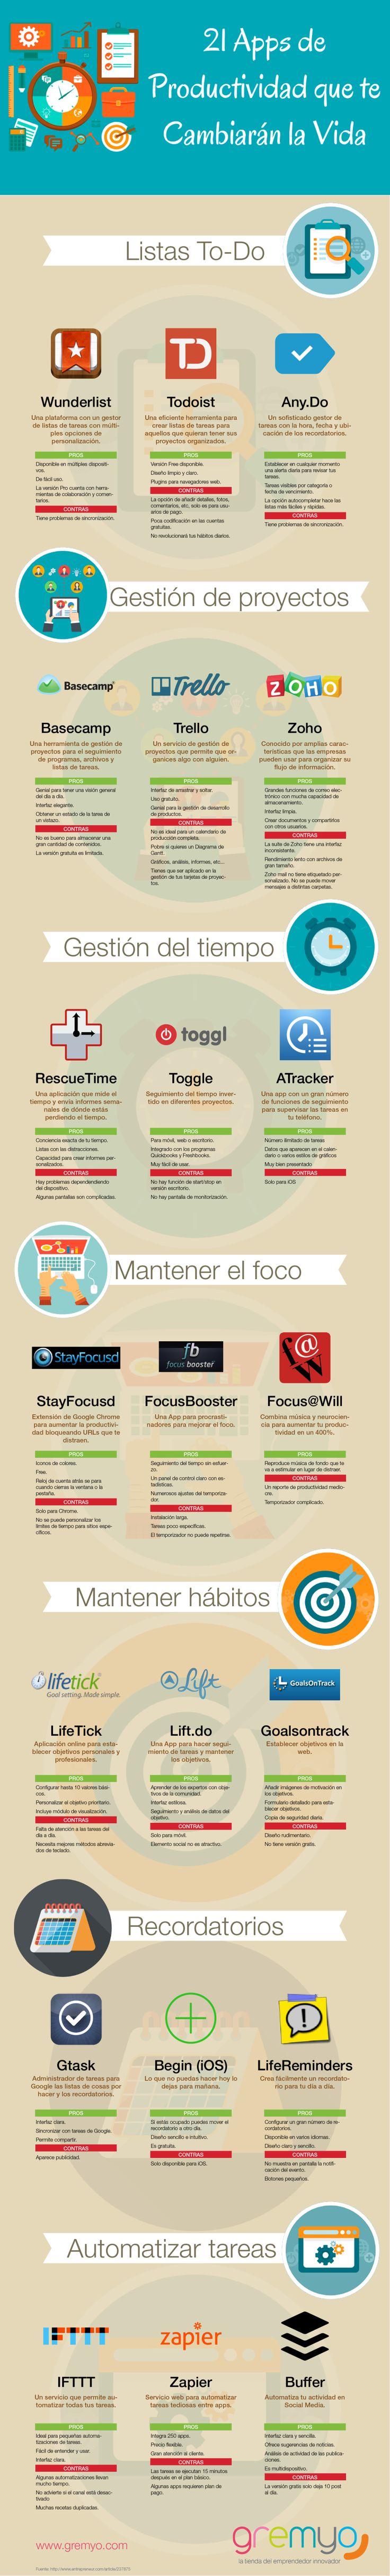 21 Apps de Productividad que te cambiarán la vida #infografia